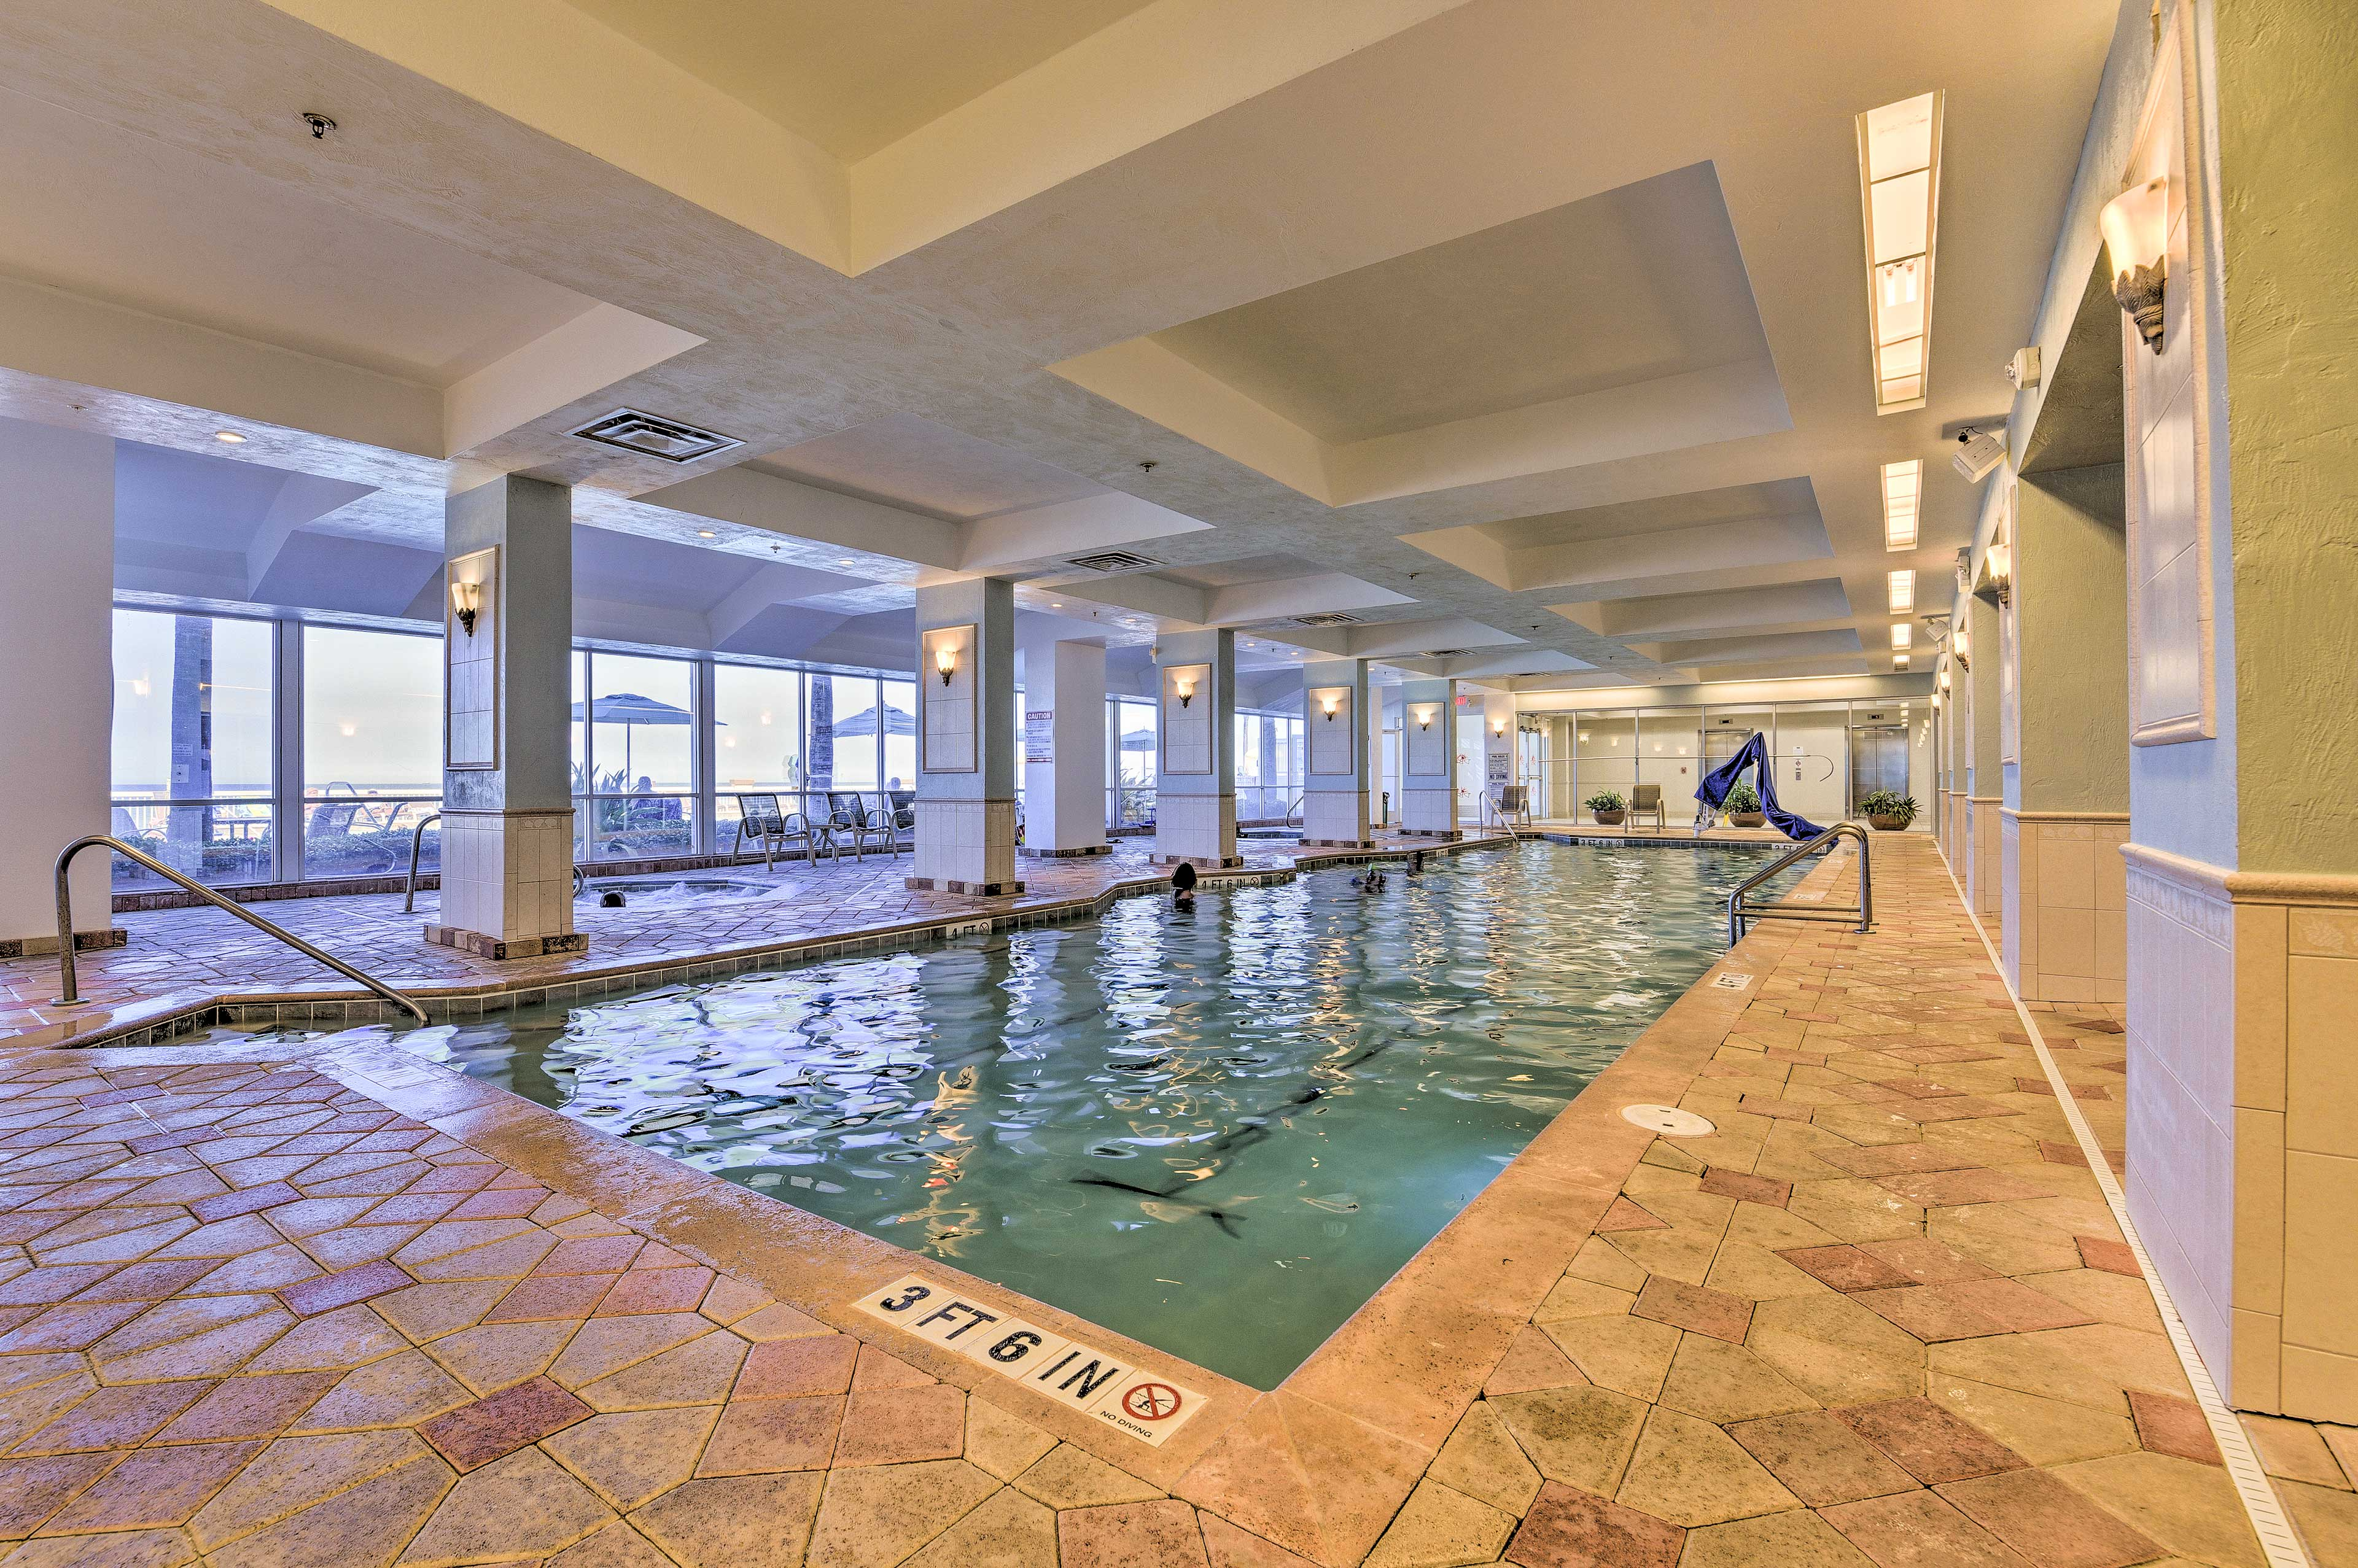 Splash around the indoor pool!